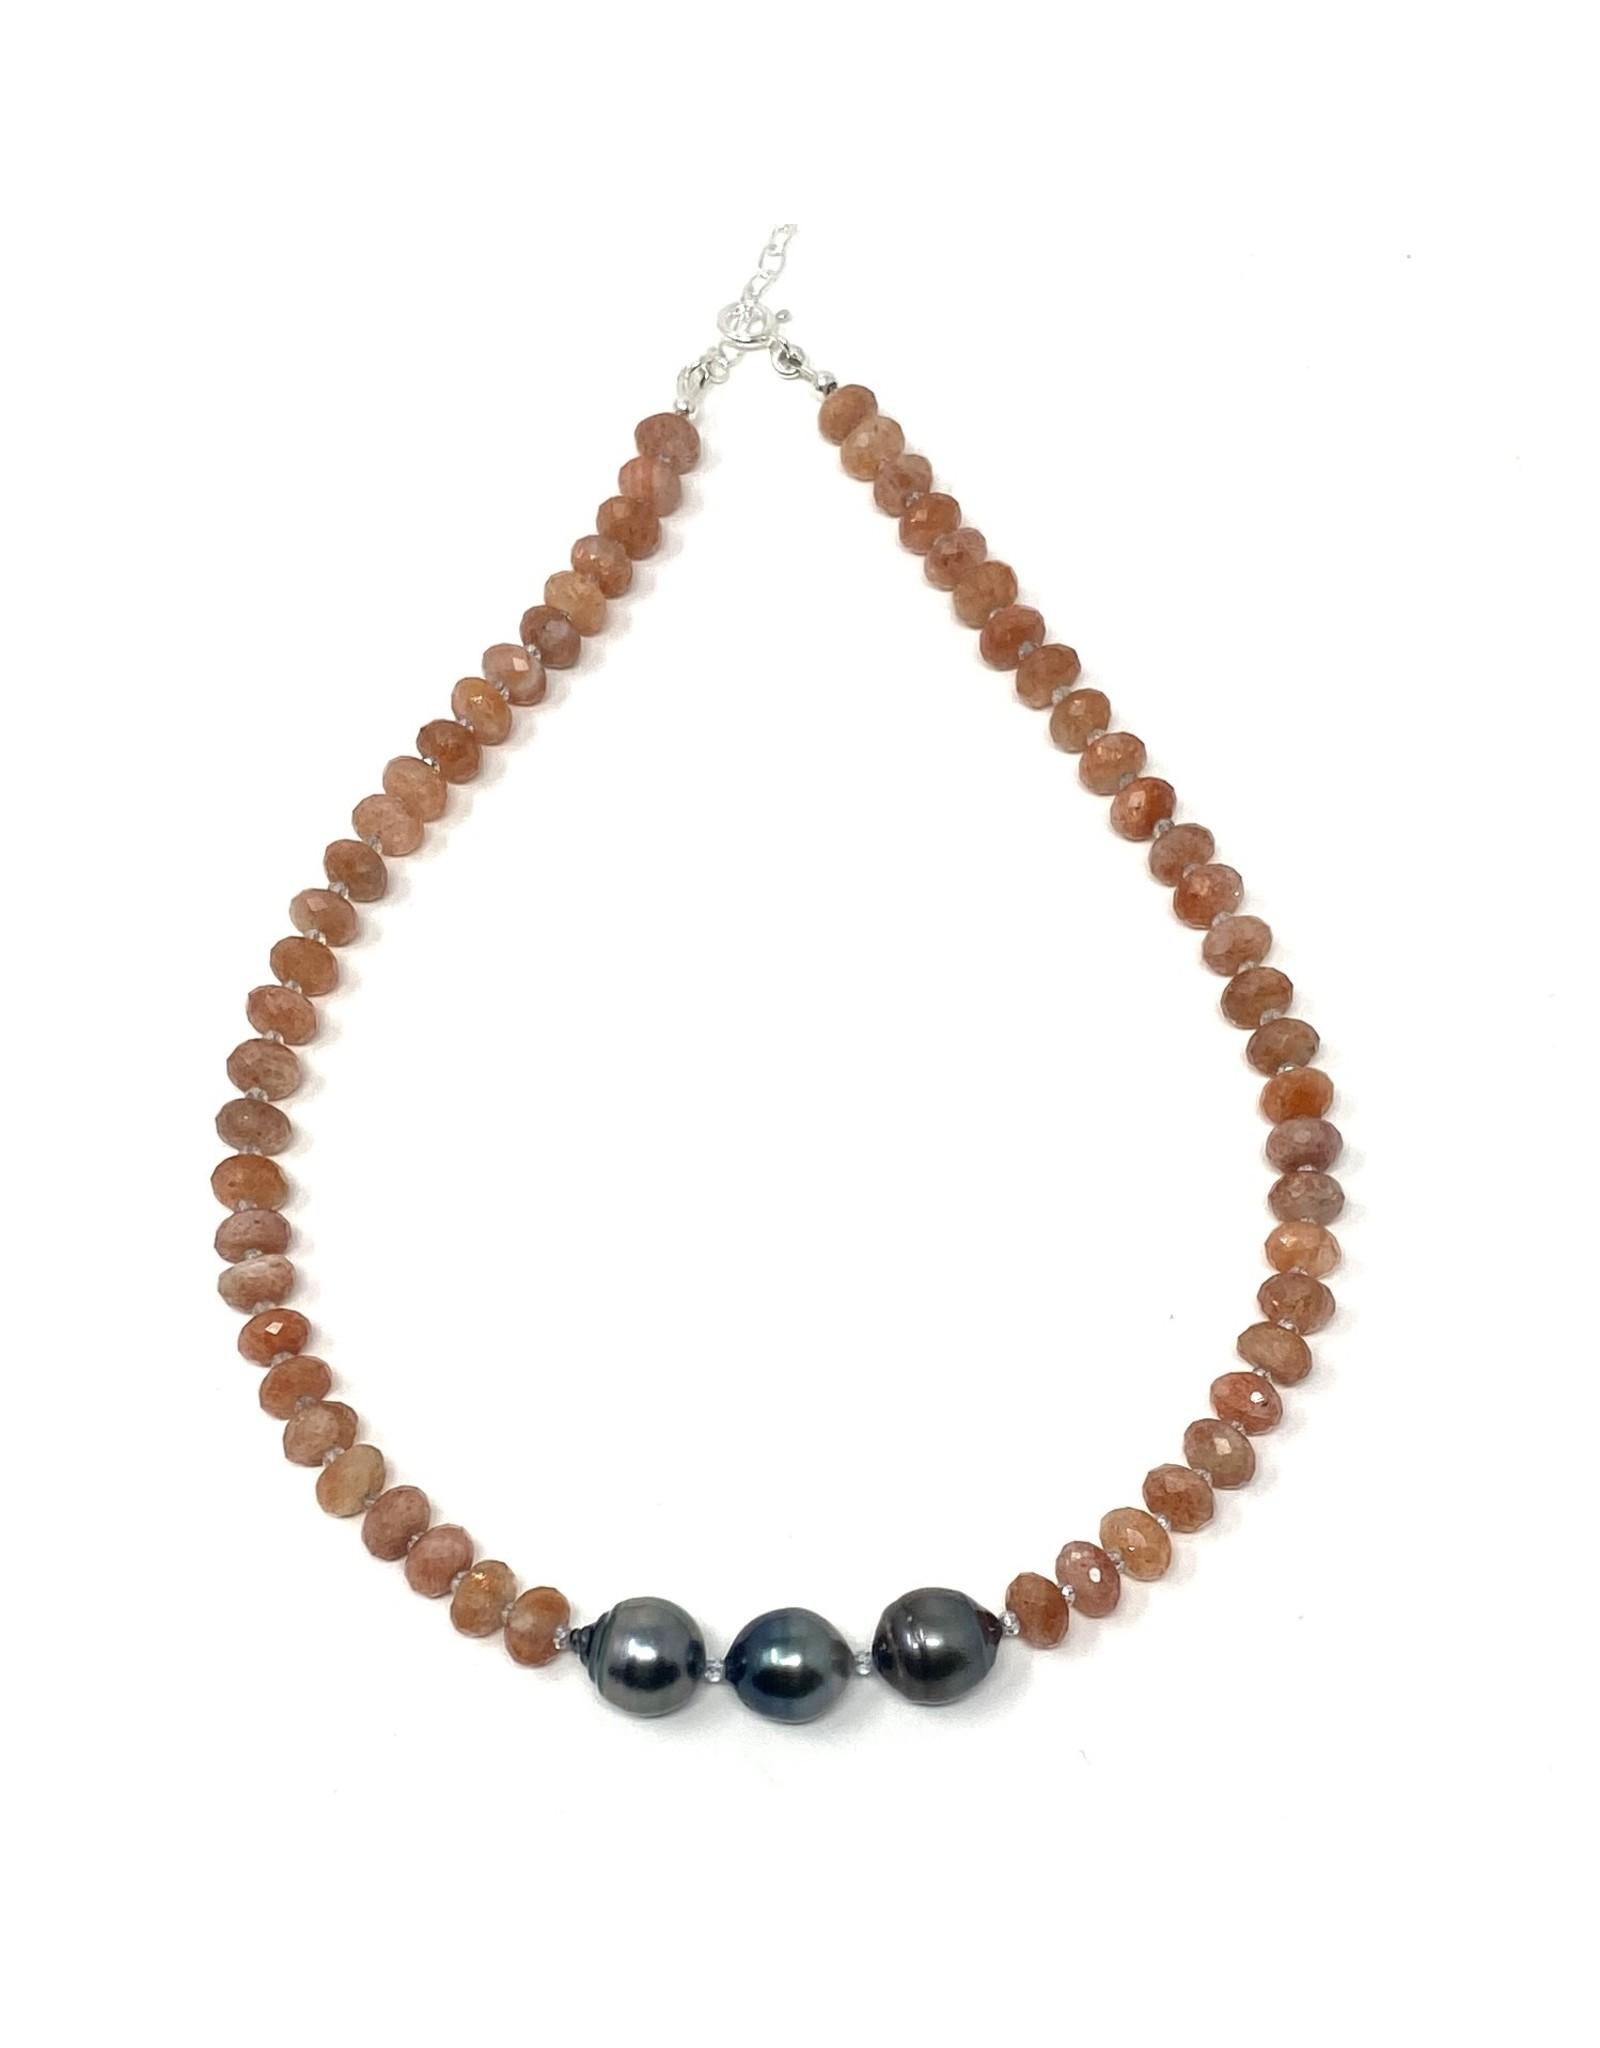 Tahitian Pearl & Carnelian Necklace